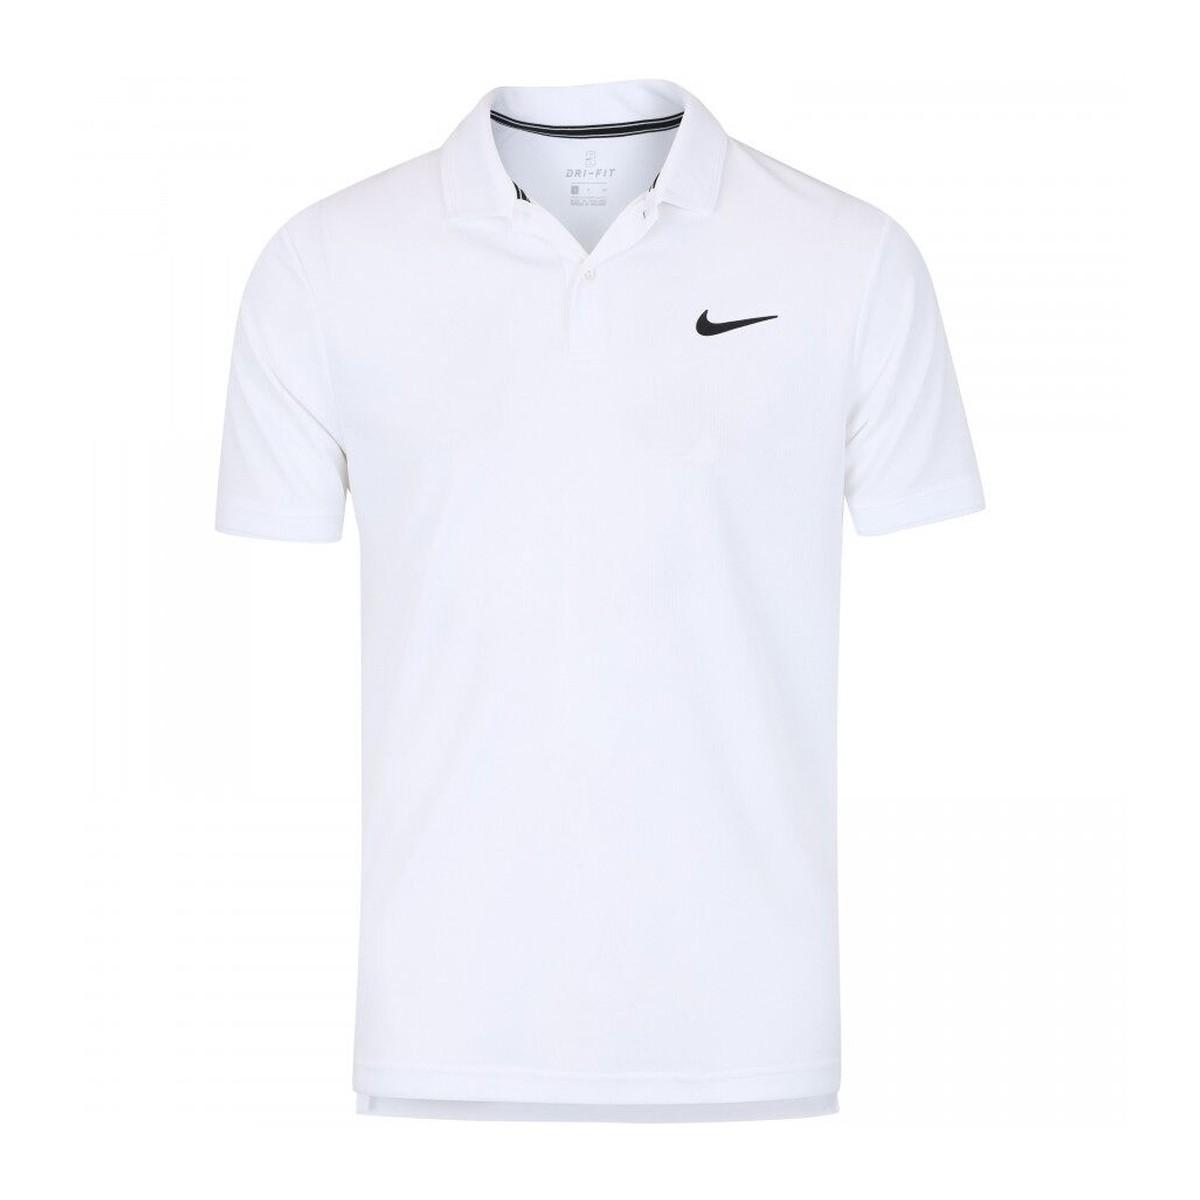 Camisa Polo Nike Dry Team Masculina Branca